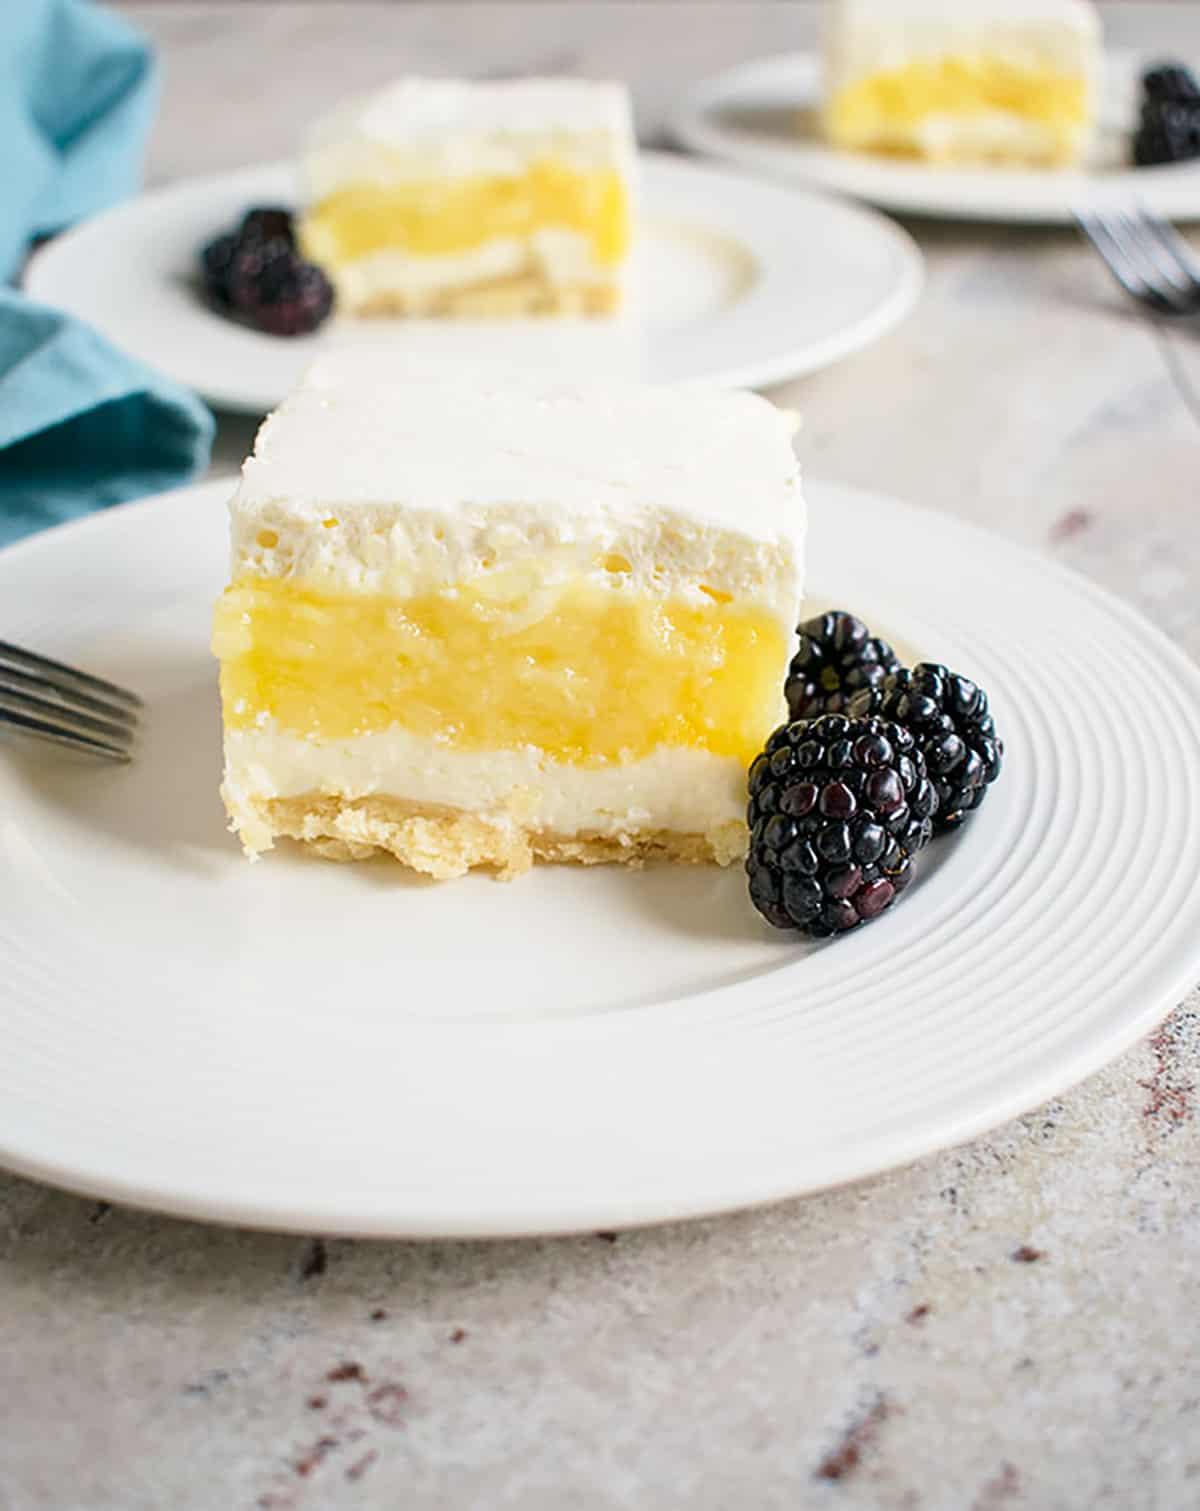 slice of lemon lush on white plate with fork and blackberries